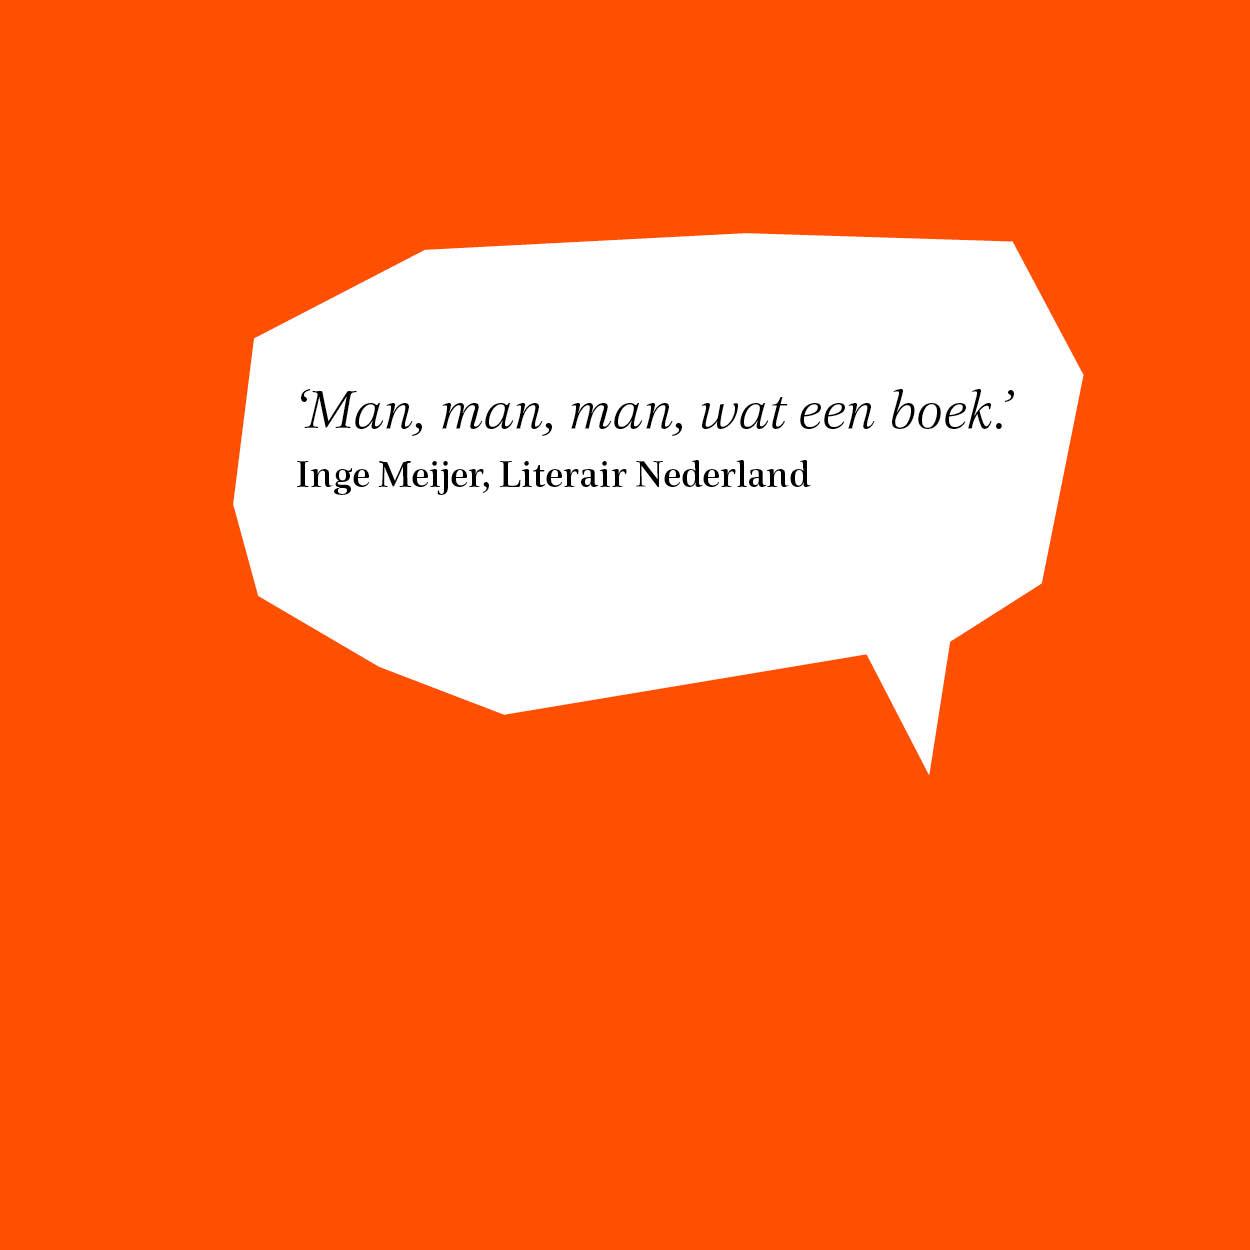 MIRTHE_WEBSITE_QUOTES_oranje.jpg